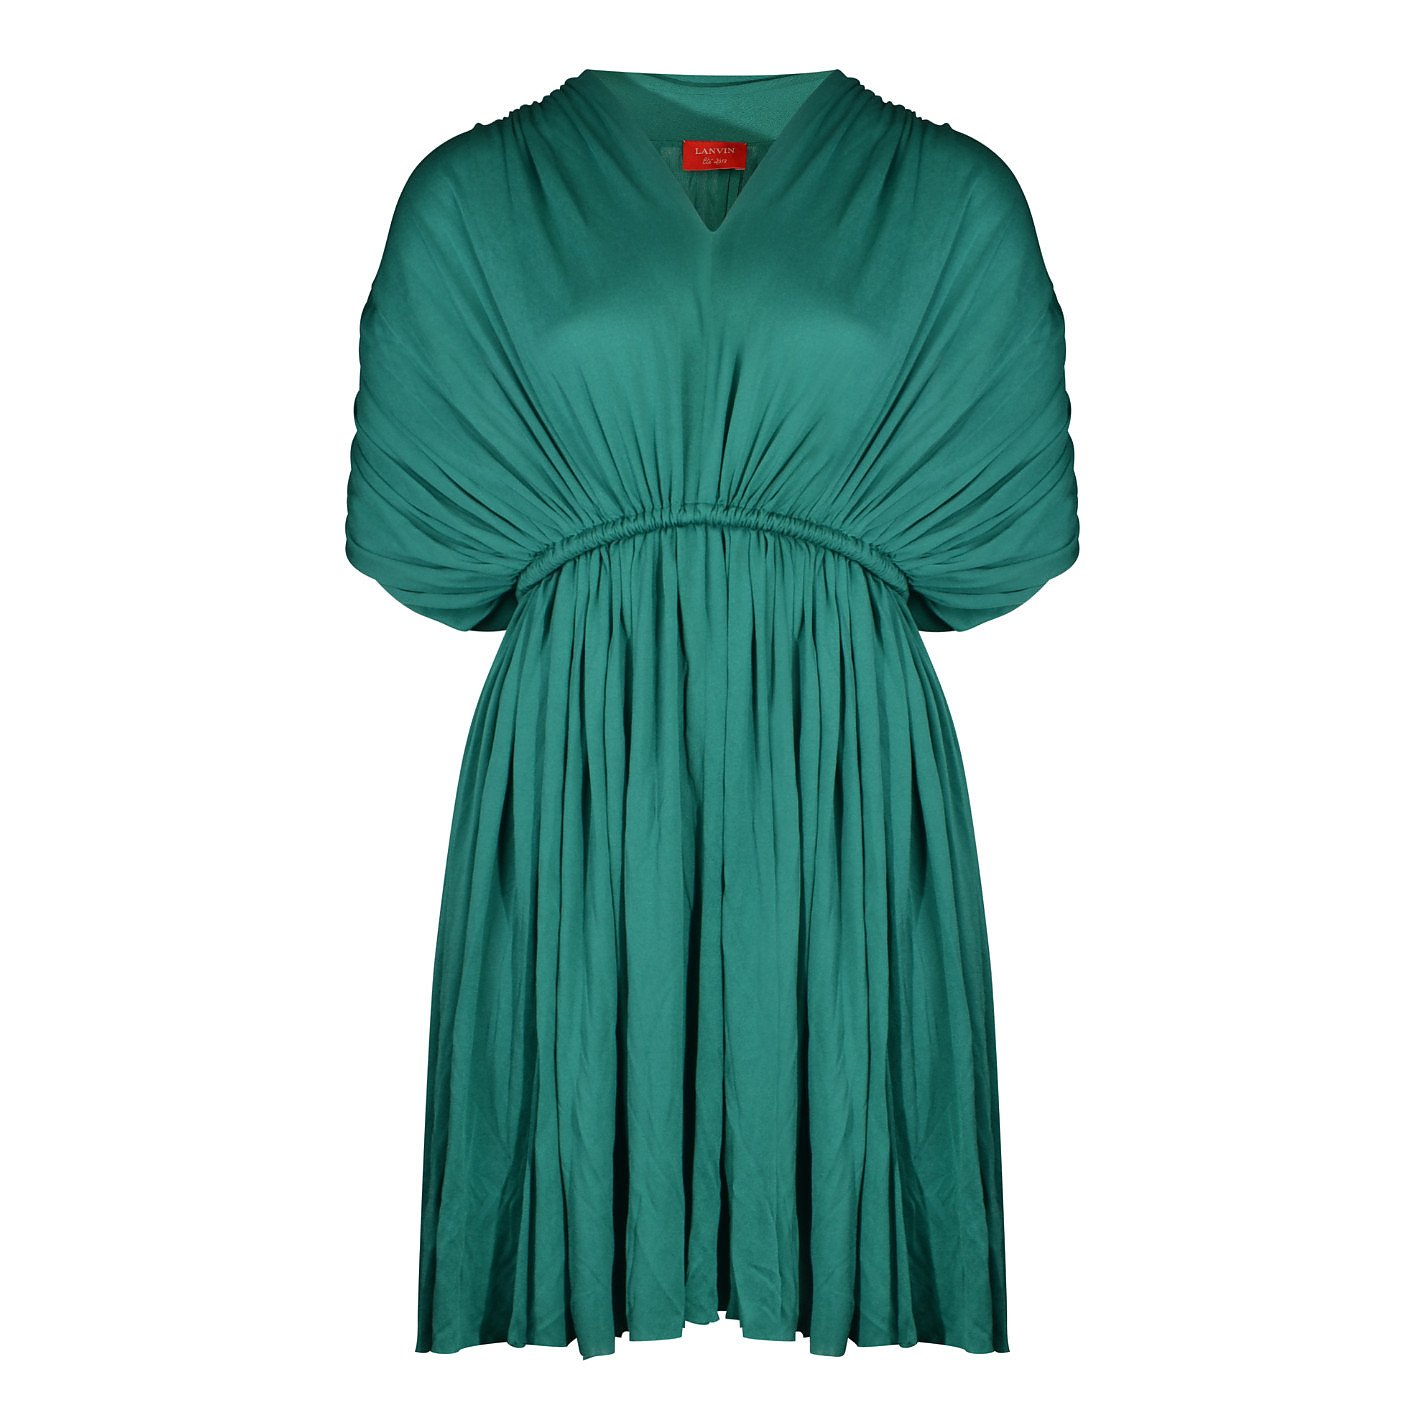 Lanvin Gathered Dress